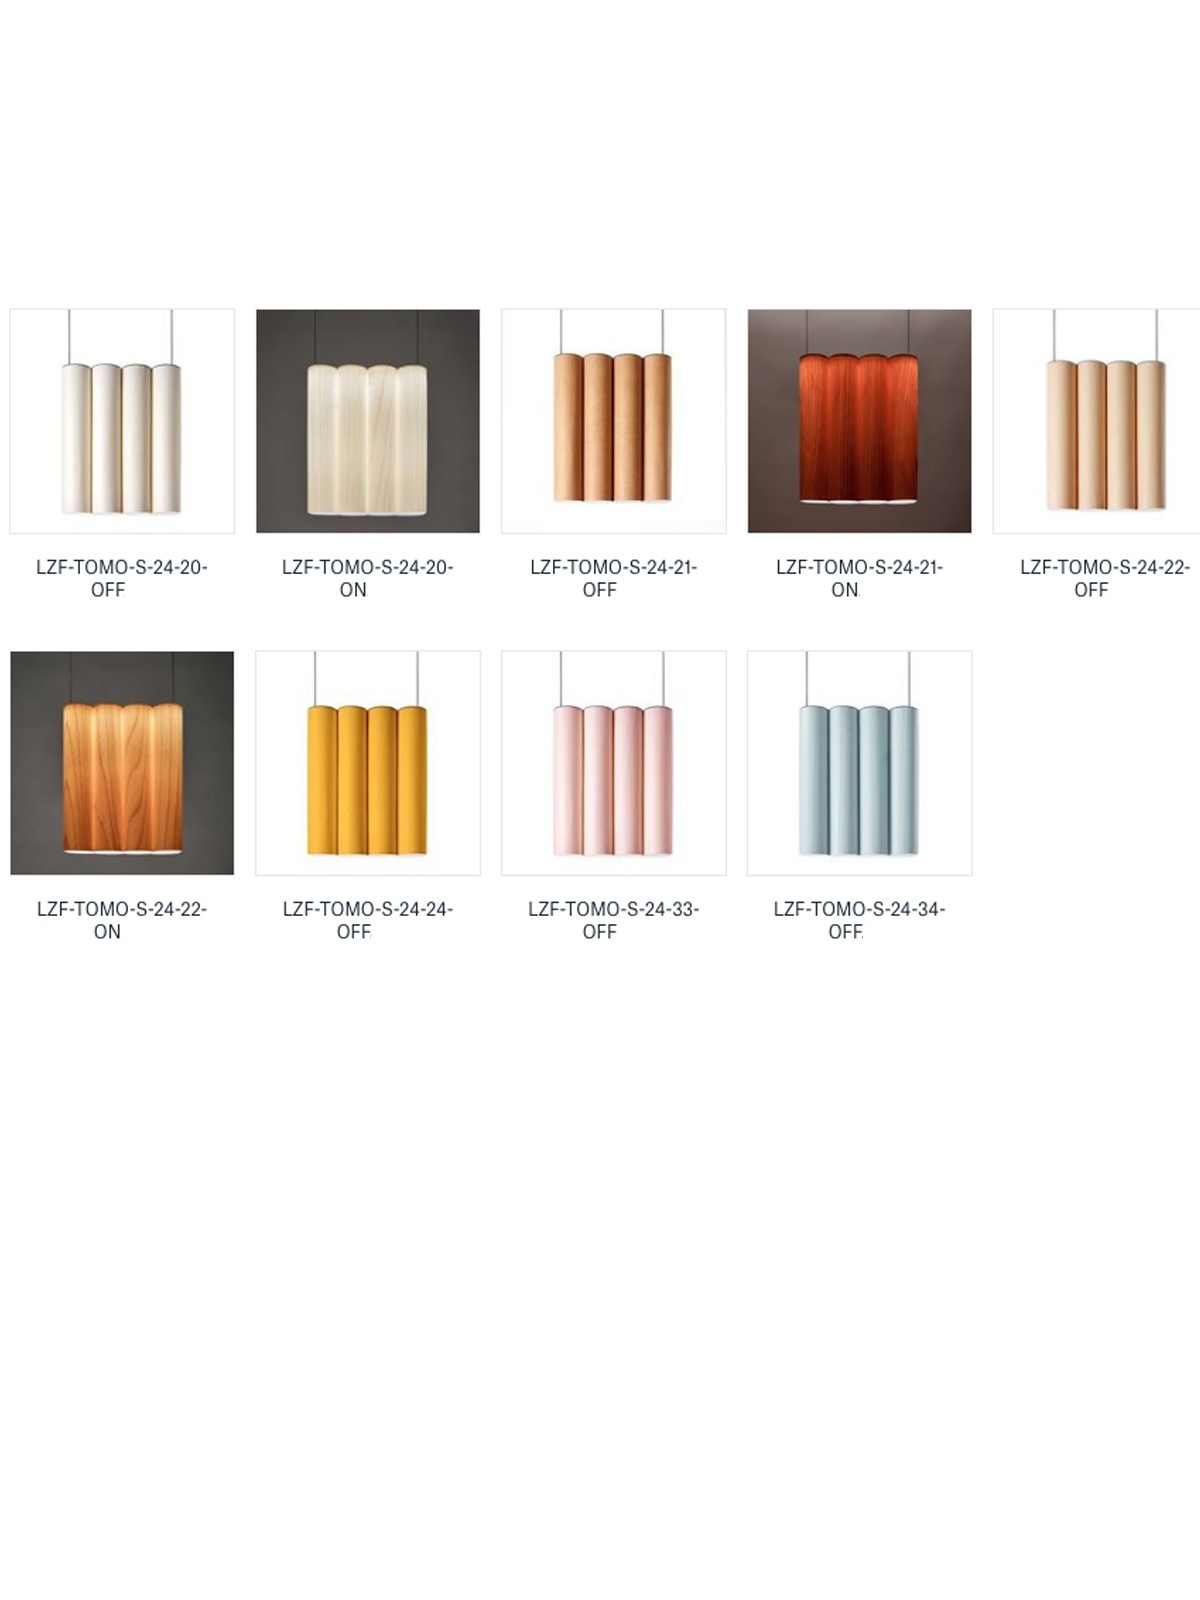 Tomo Tall LZF Holzleuchte Farben DesignOrt Berlin Onlineshop Lampen